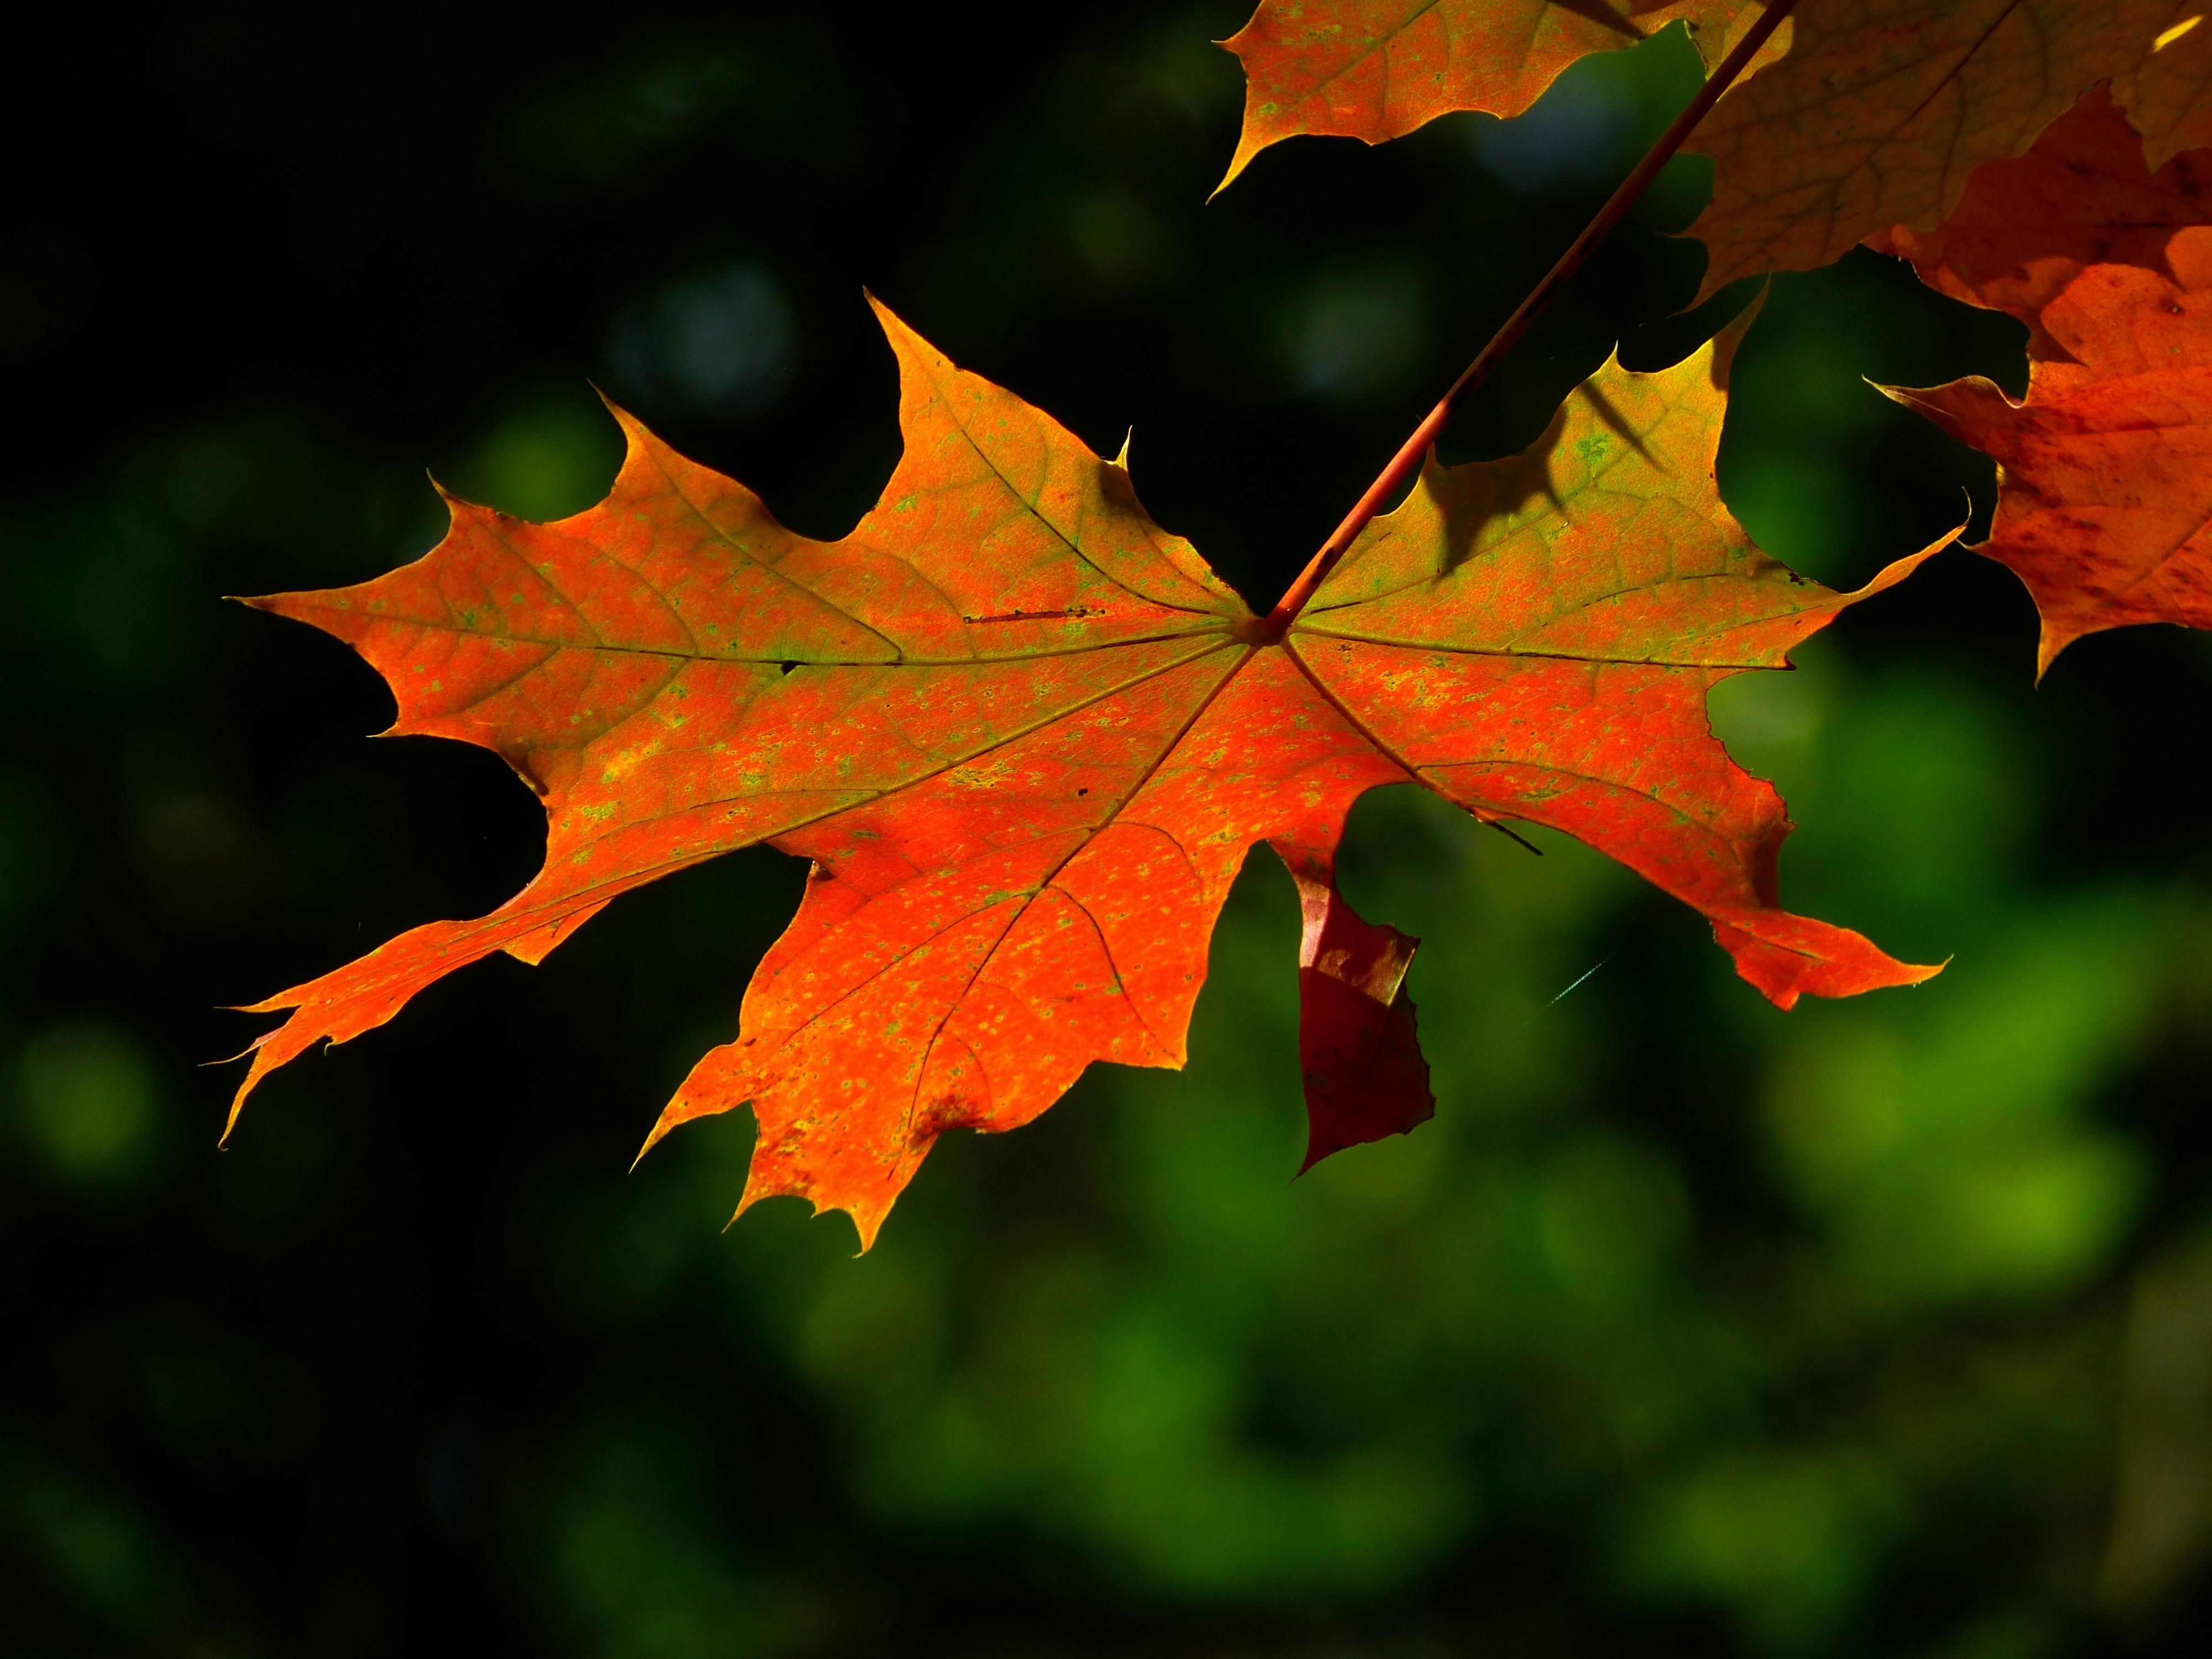 Free Images : nature, branch, flower, color, autumn ...